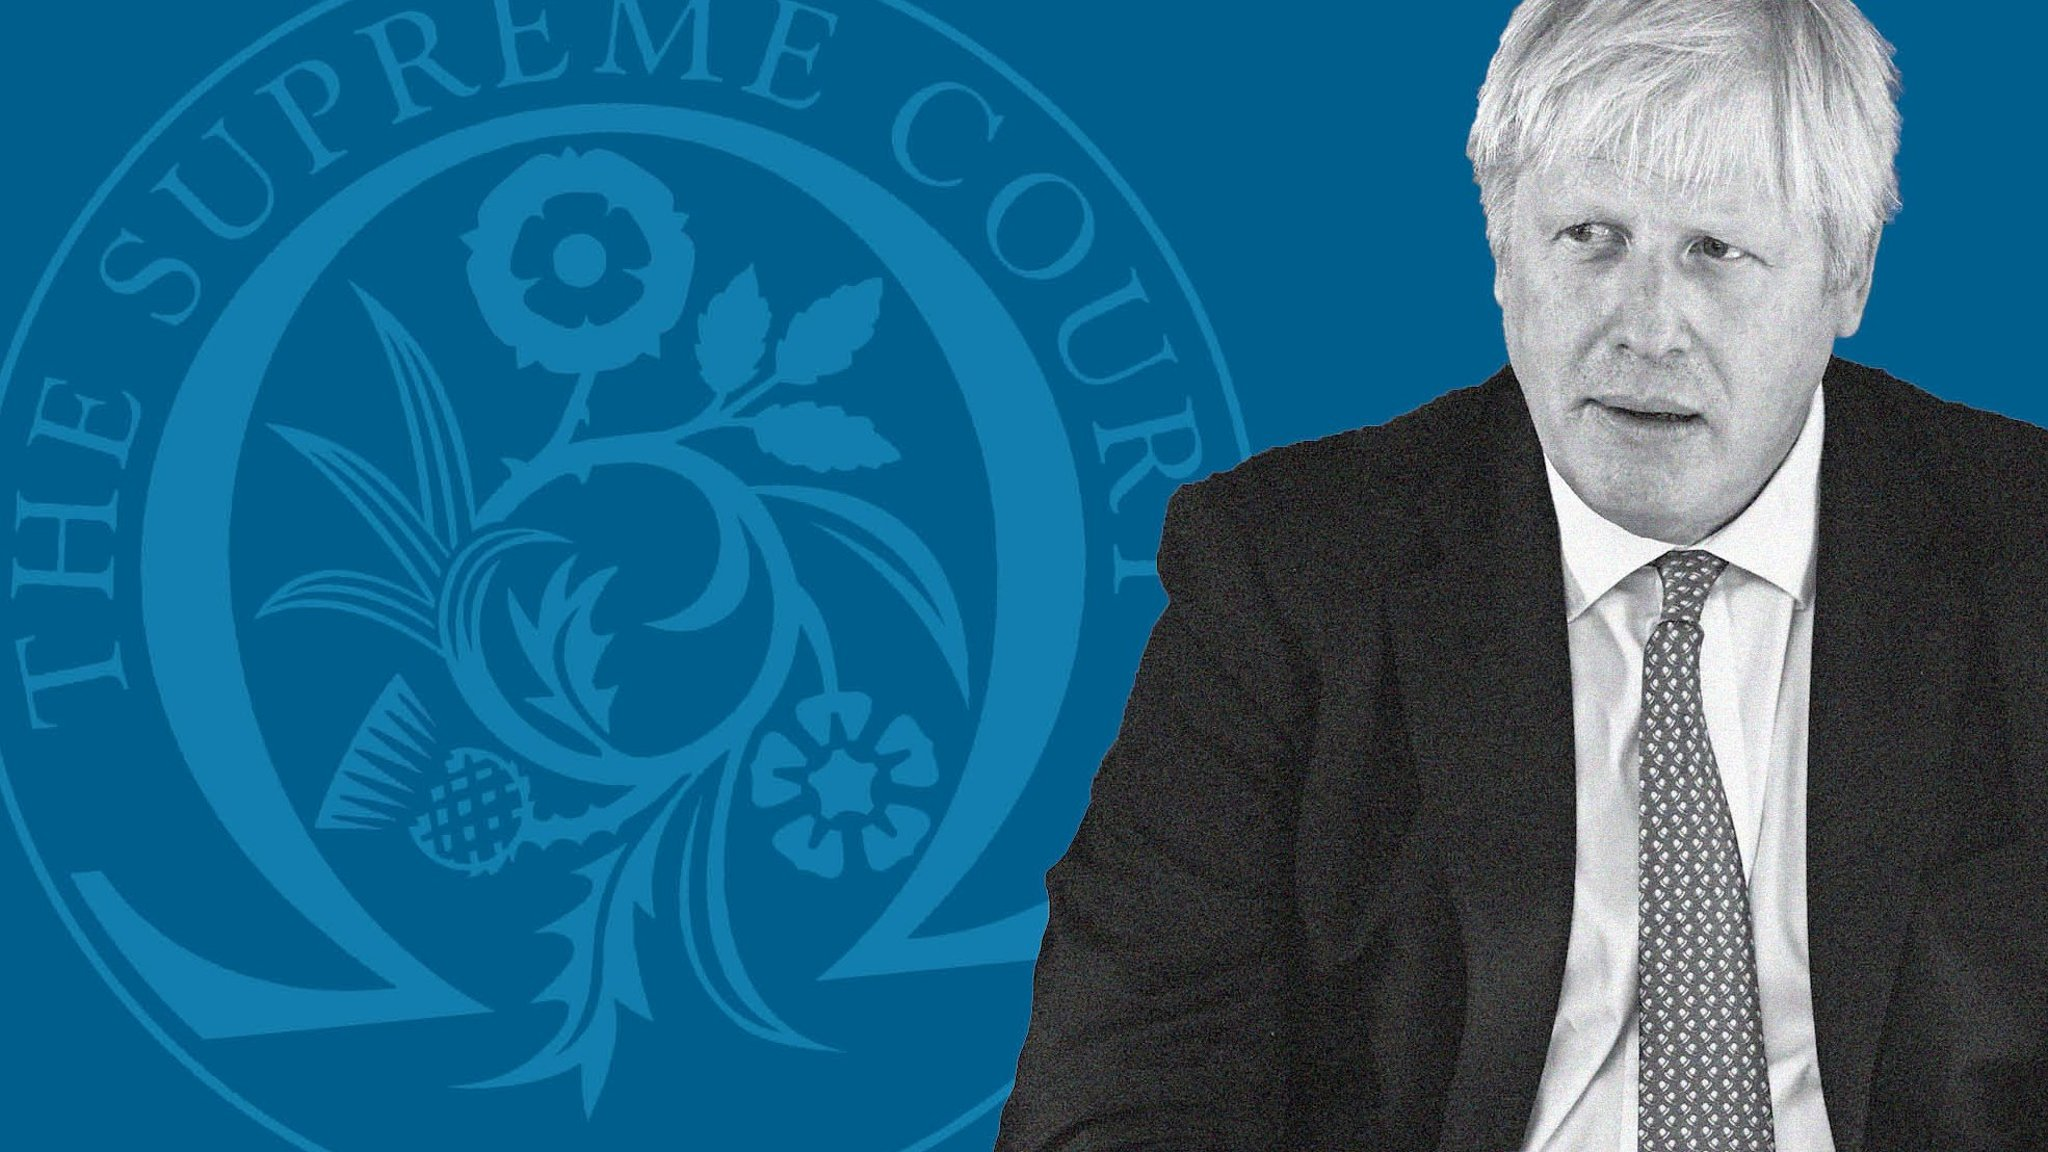 Boris Johnson and prorogation test British constitution